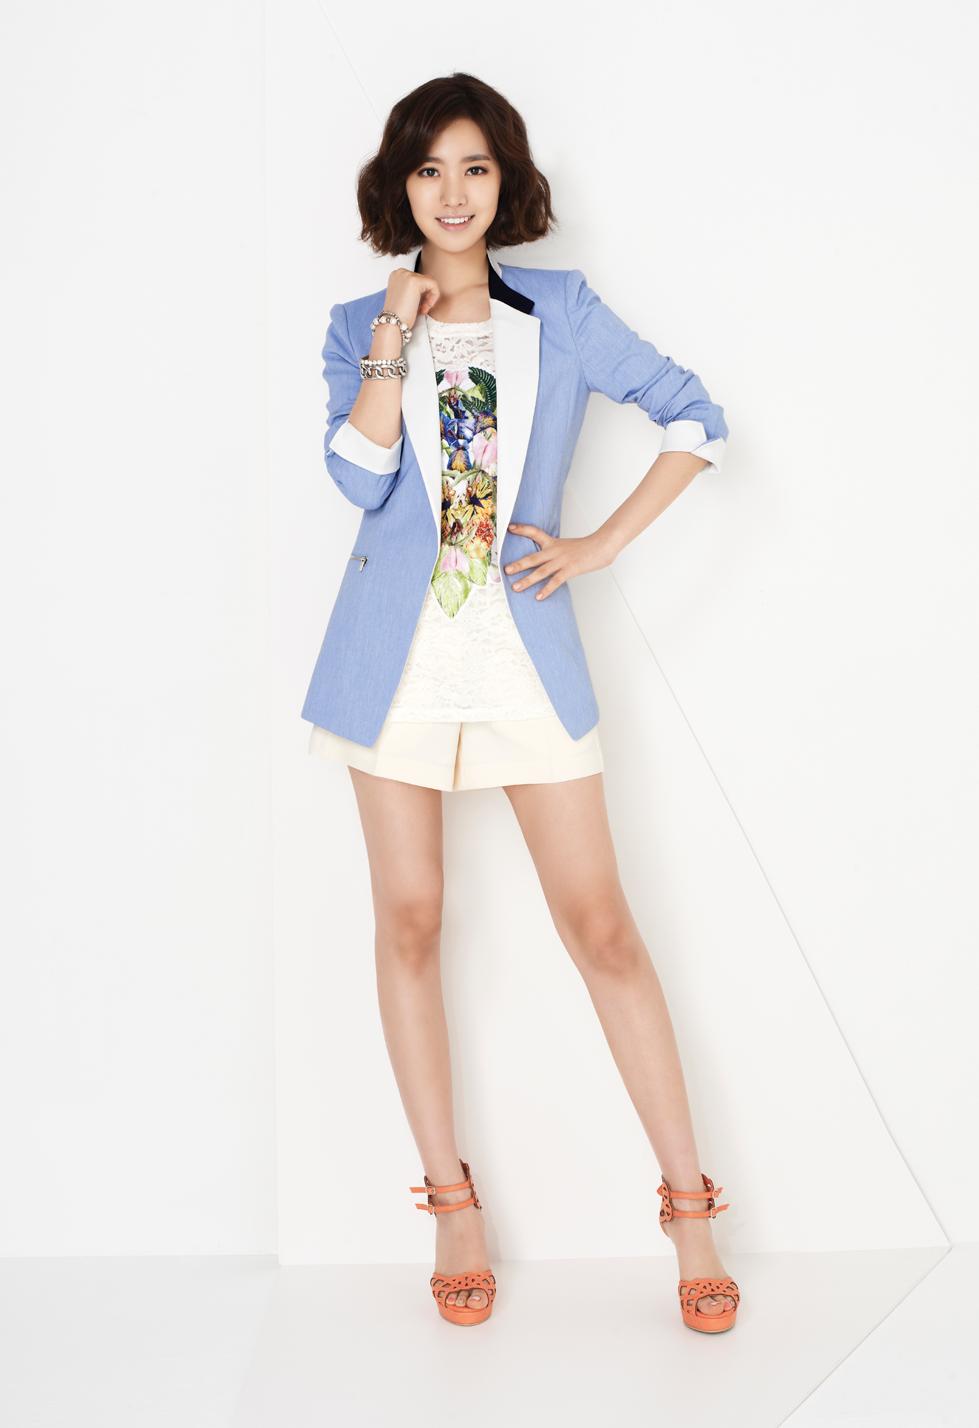 Ropa juvenil coreana verano imagui Modelos de locales de ropa